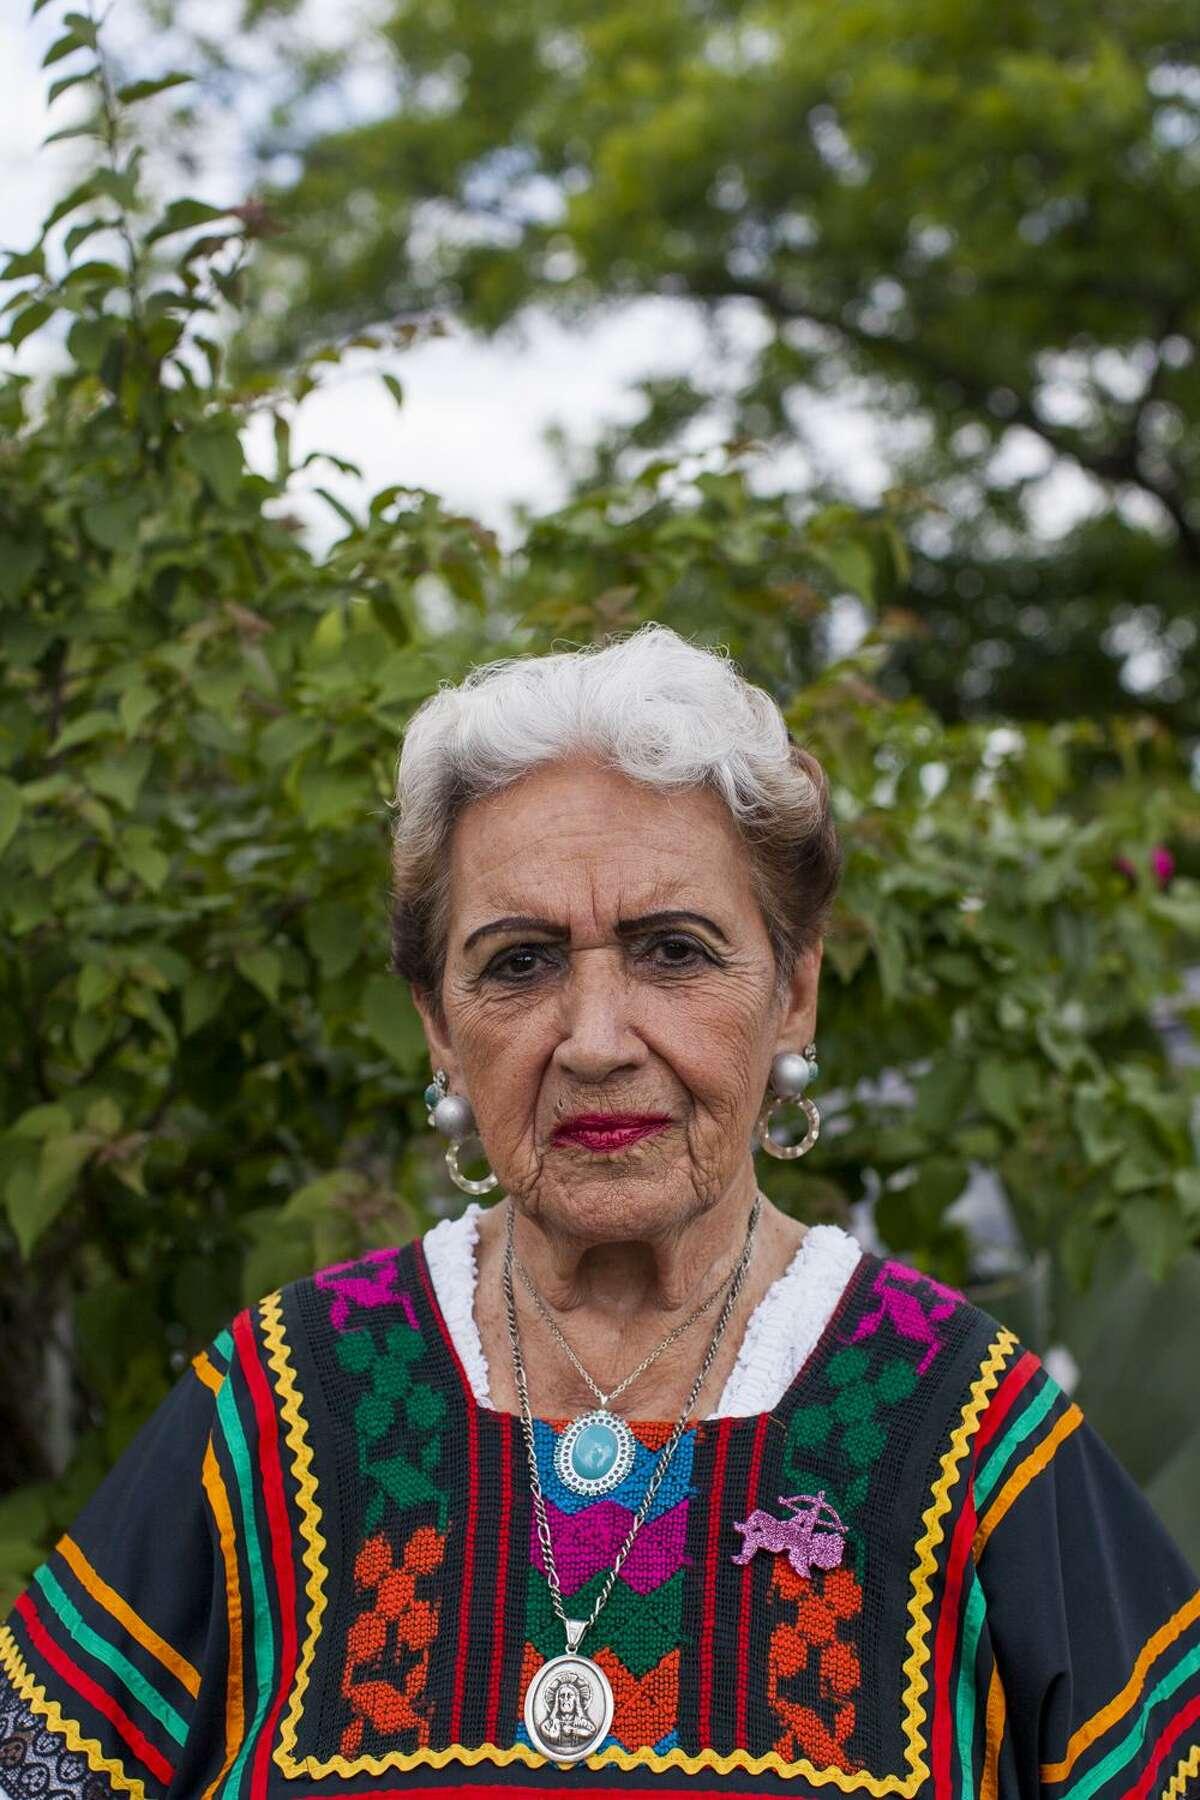 Portrait of Golden age ranchera singer Rita Vidaurri, 90, outside of her home Monday May 4, 2015. Vidaurri's mother died when Rita was 14 years old,